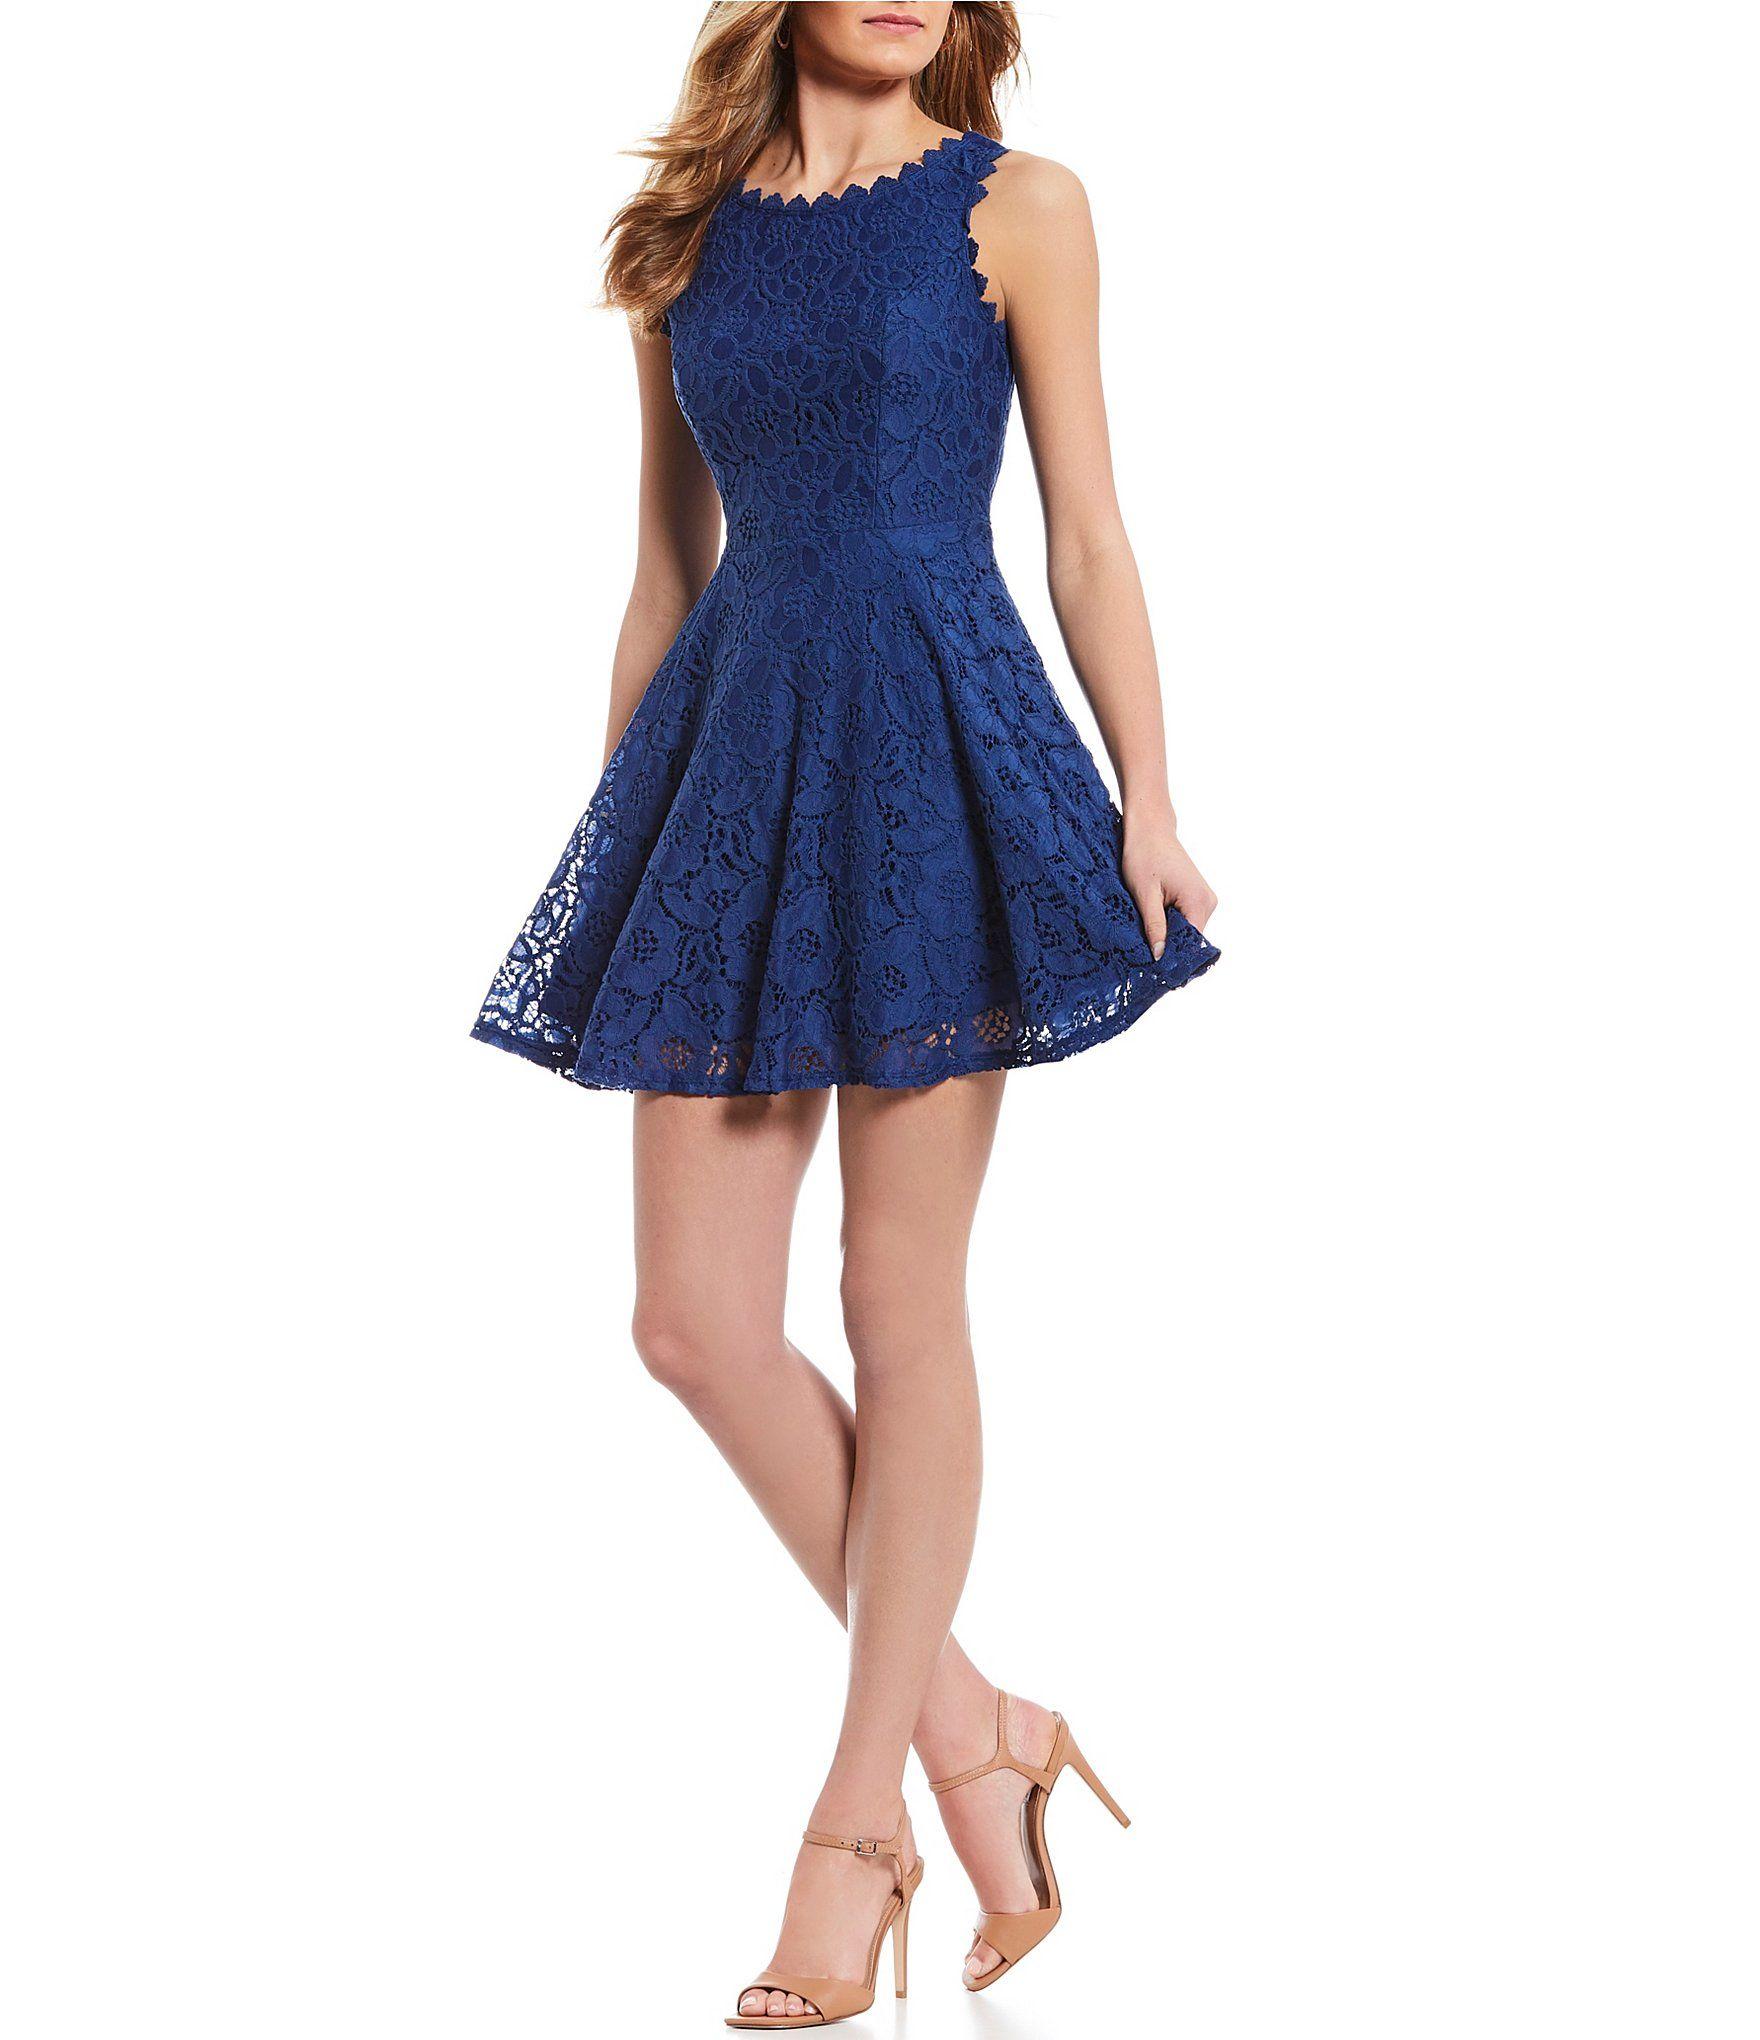 f560f3cc9f Shop for Jodi Kristopher Lace A-line Dress at Dillards.com. Visit  Dillards.com to find clothing